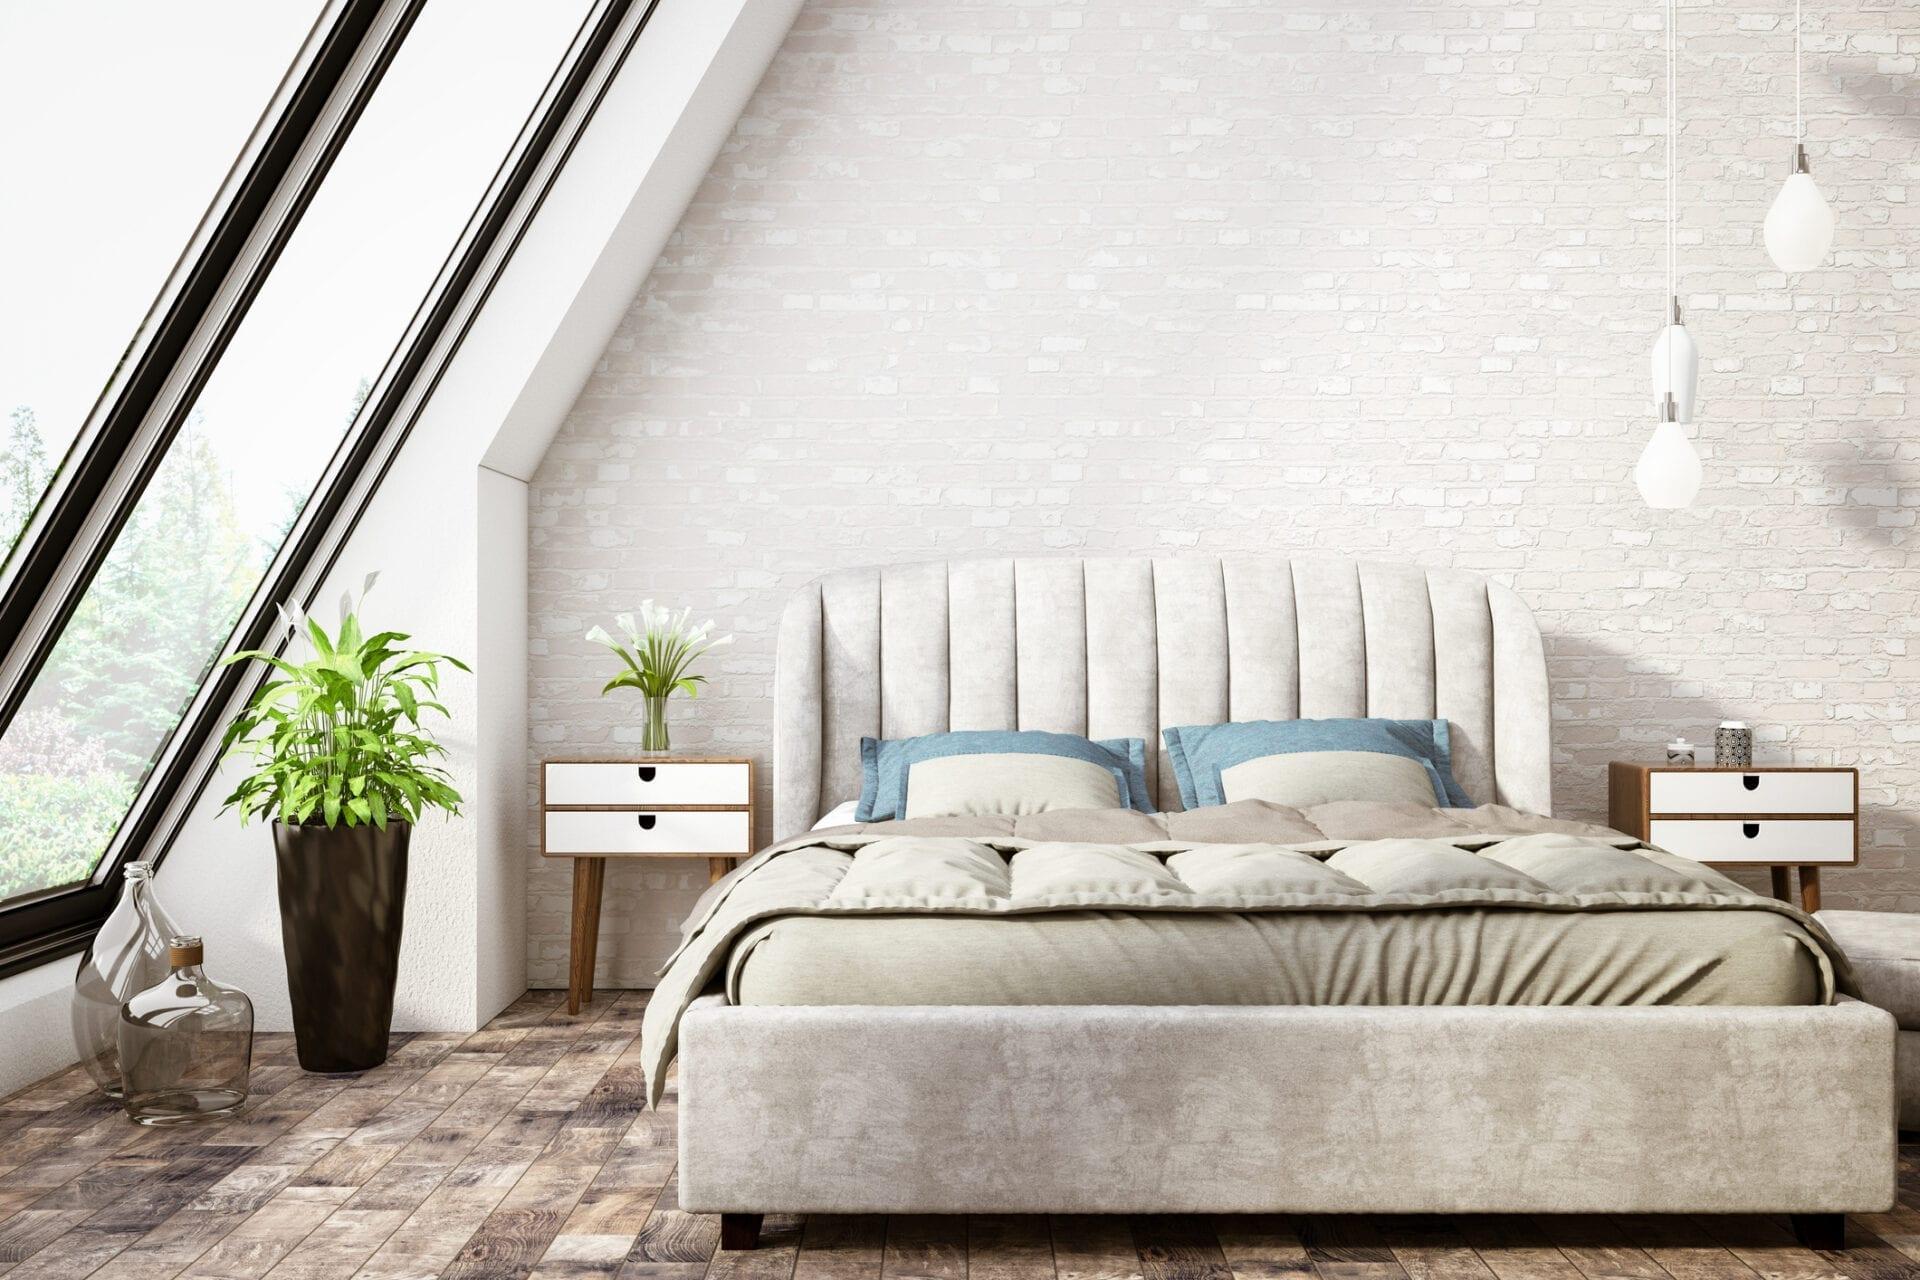 Rosalini - Wall mounted upholstered, luxury headboard with custom upholstered wall panels - Custom luxury, upholstered beds with high end, bedroom textiles   Blend Home Furnishings